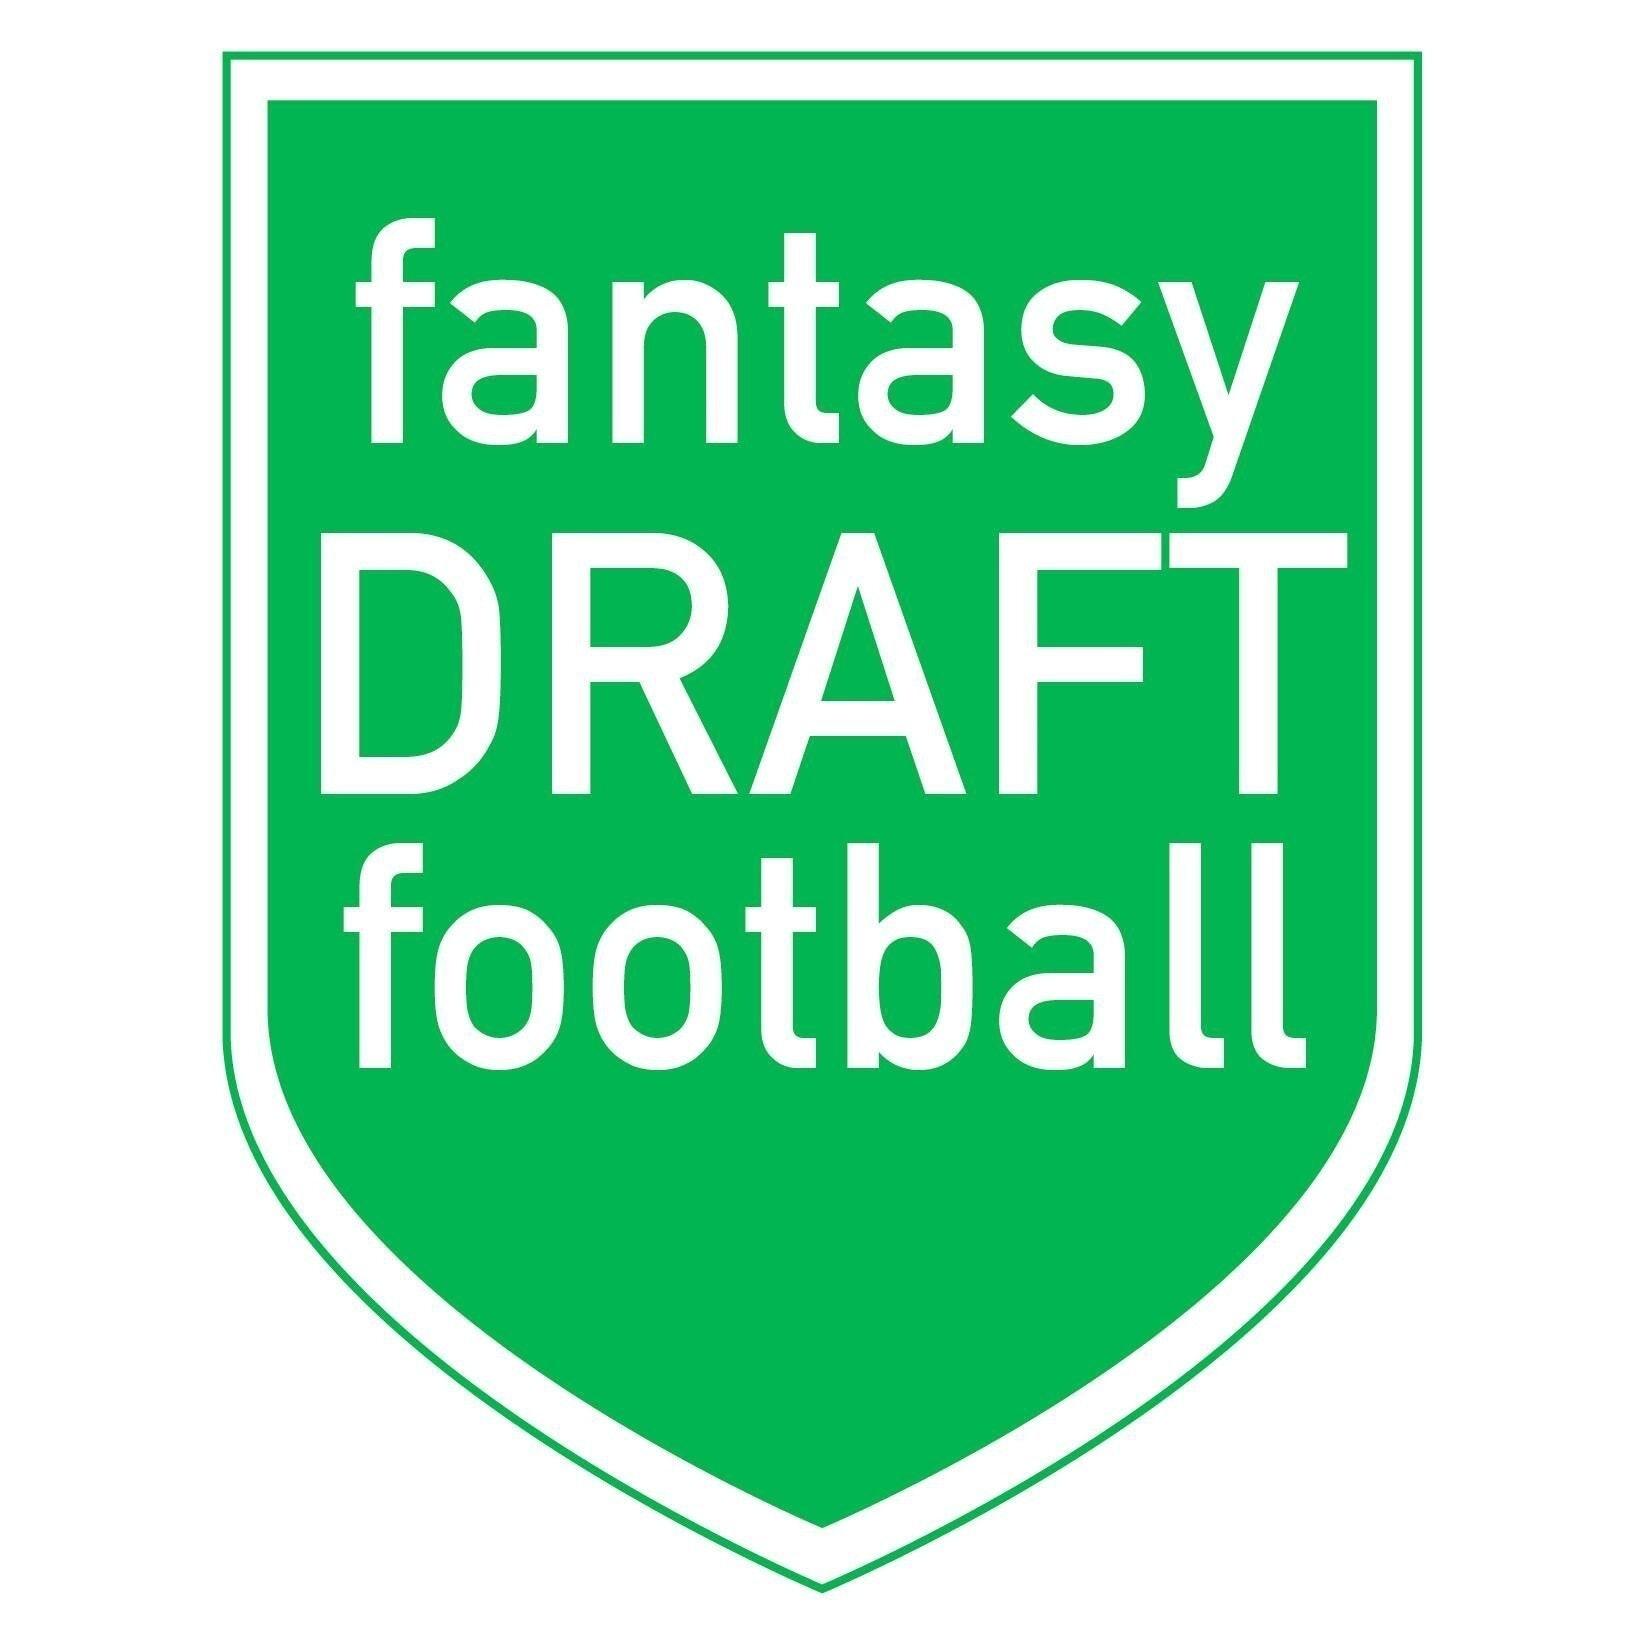 DraftFantasyFootball